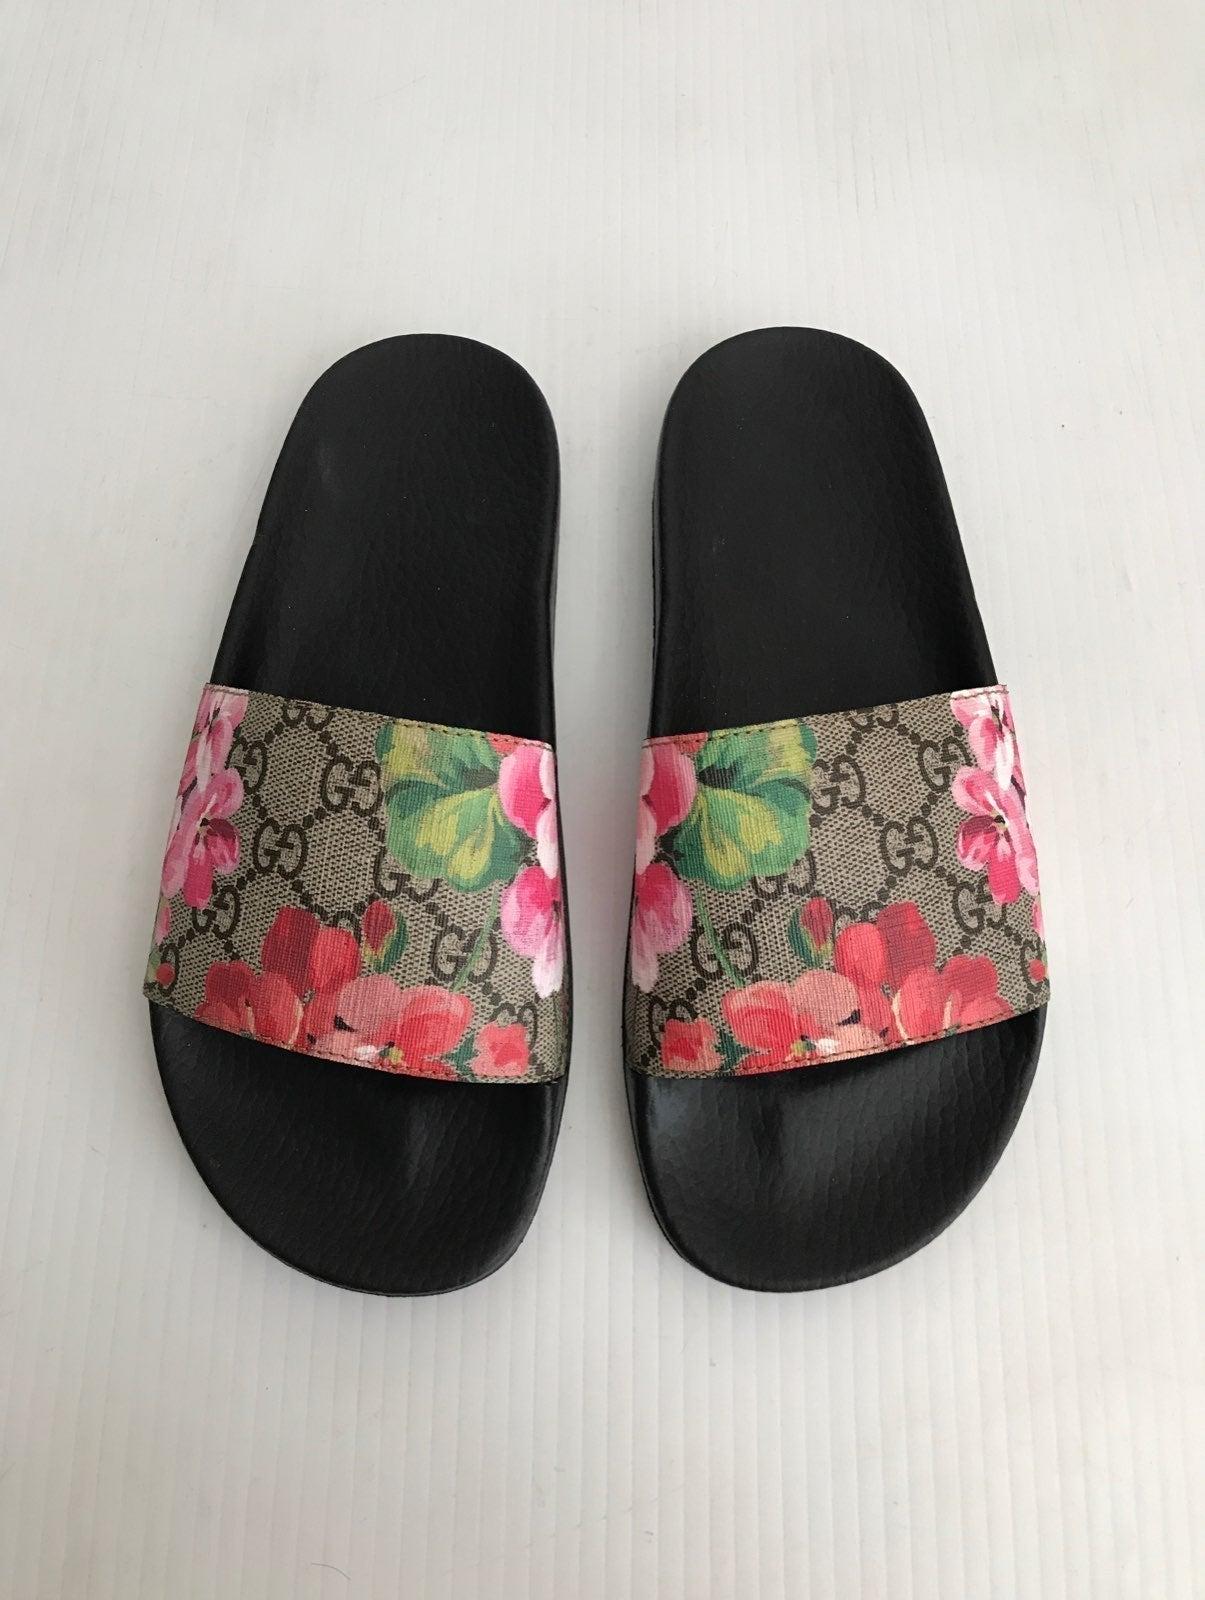 Gucci GG Bloom Pursuit Slide Sandal 37